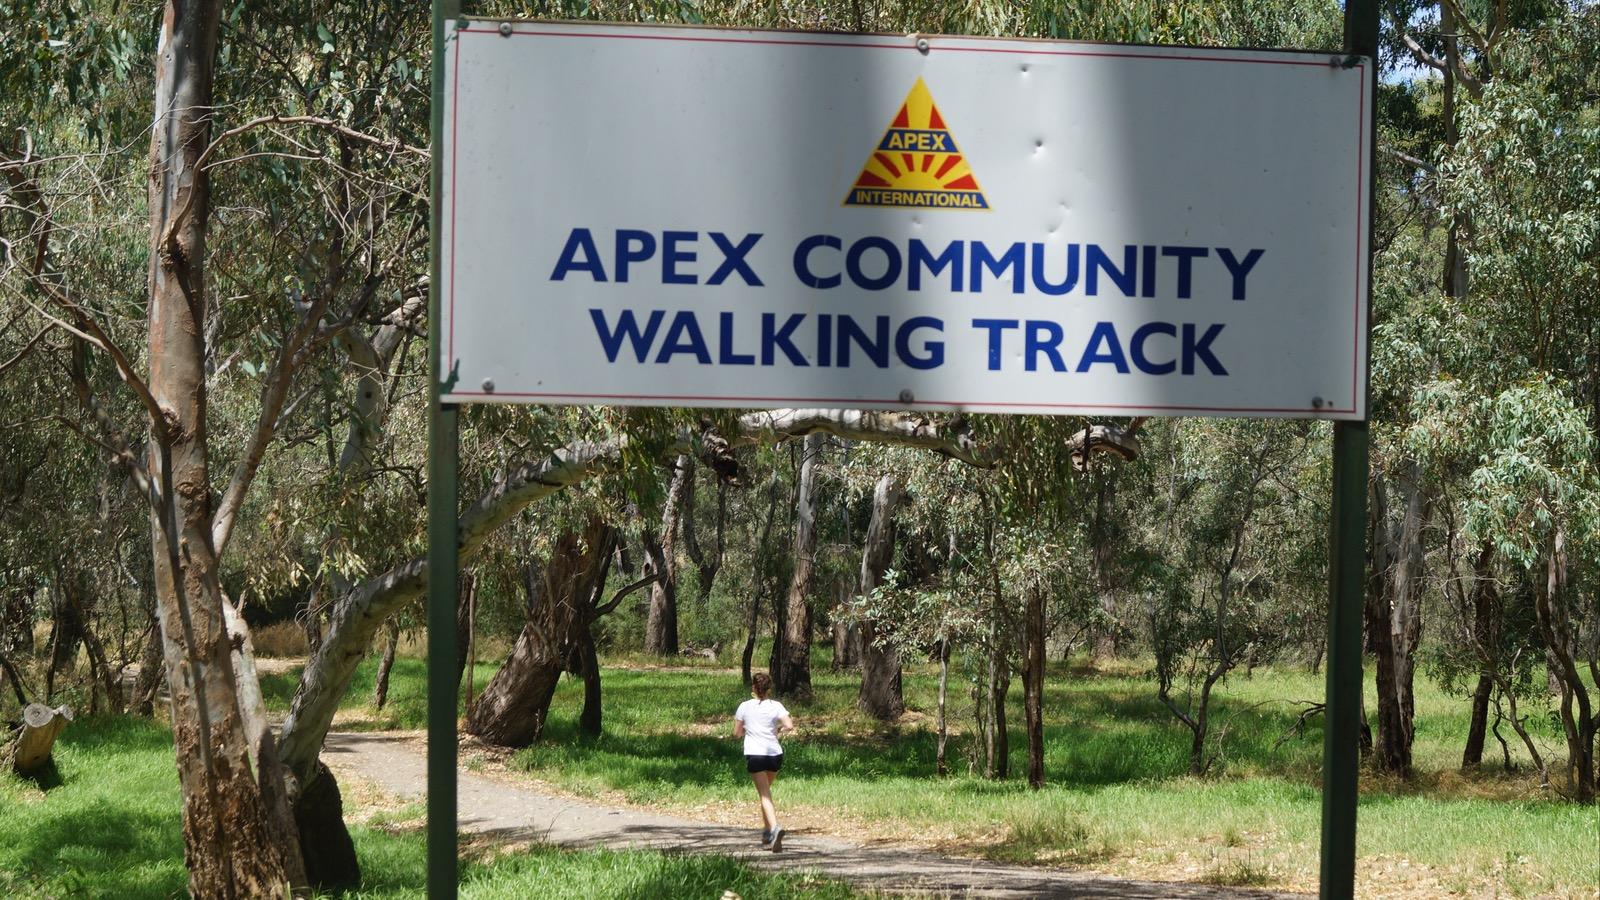 Euroa Apex Walking Track